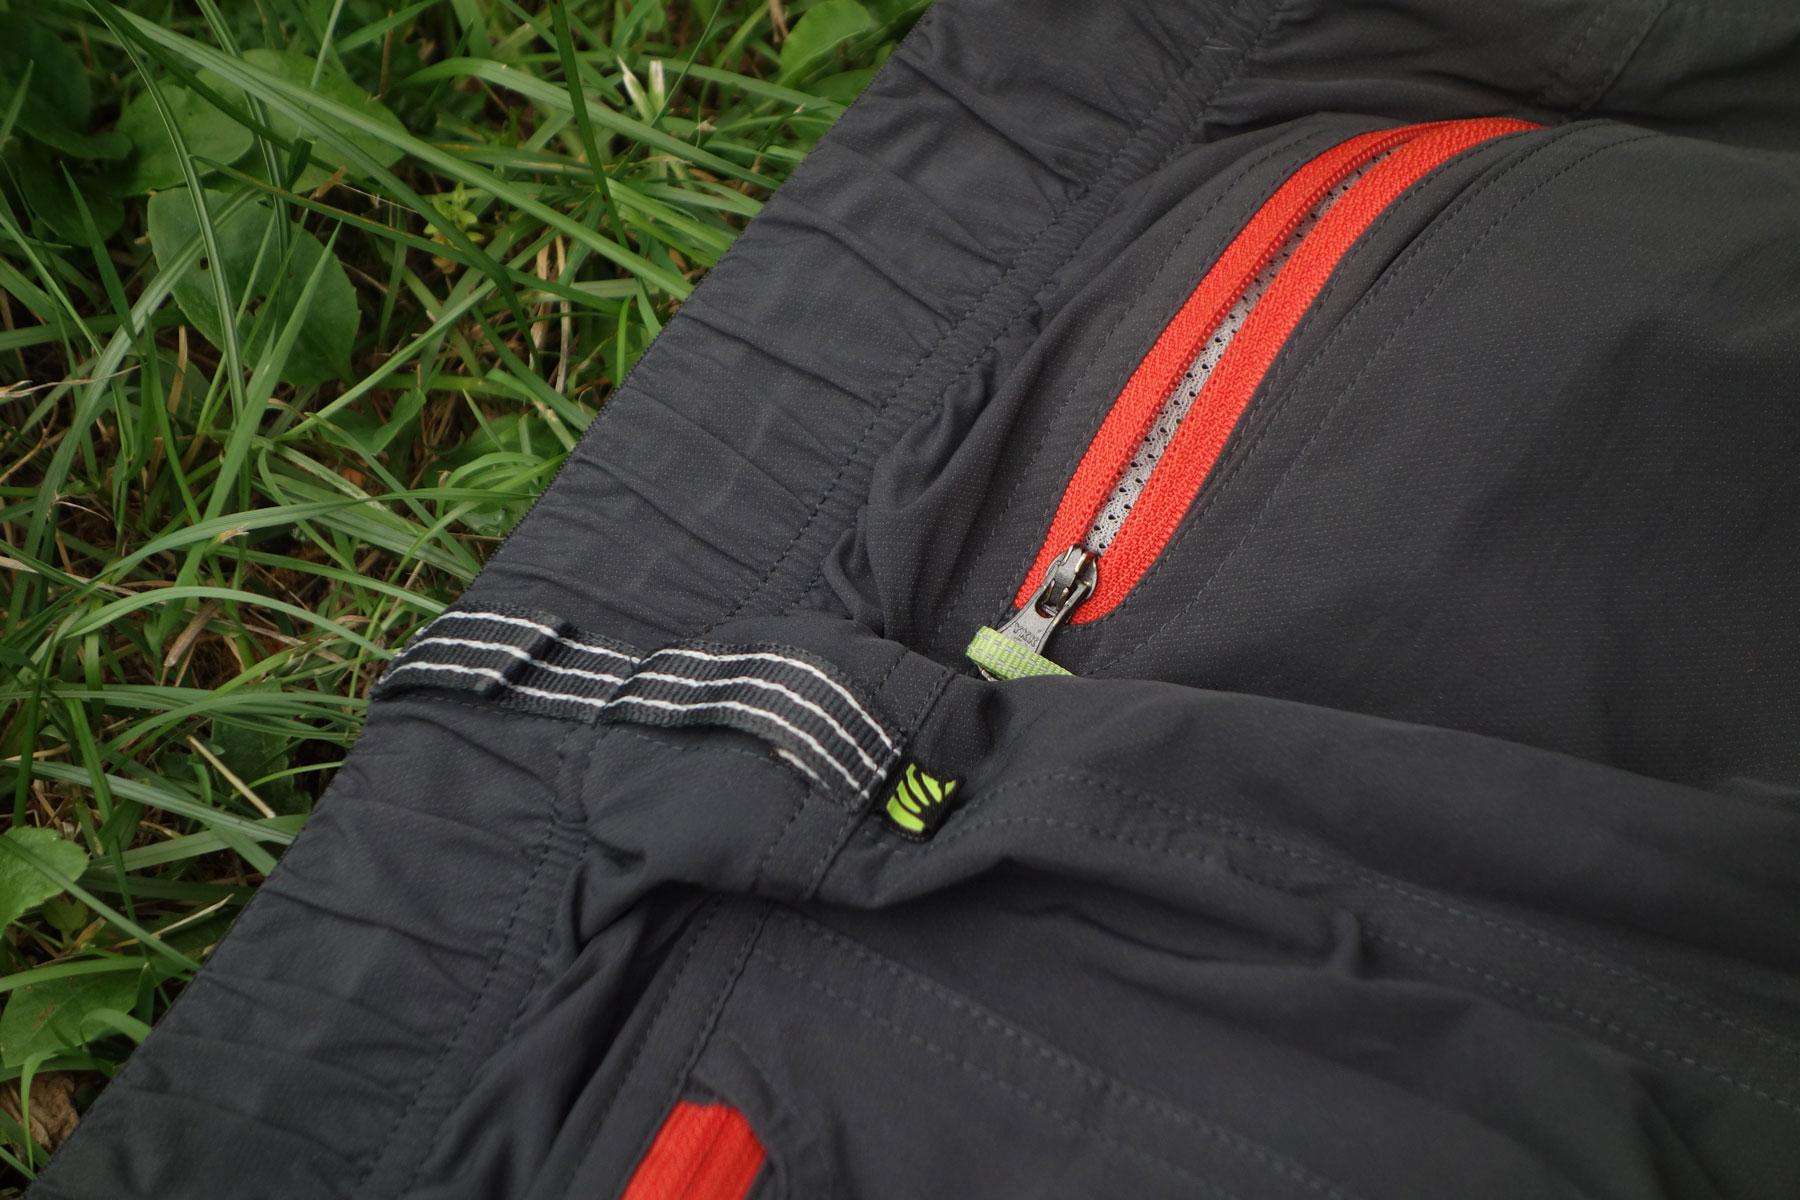 Karpos rock fly, turistické a lezecké nohavice, ykk zips na zadnom vrecku, recenzia